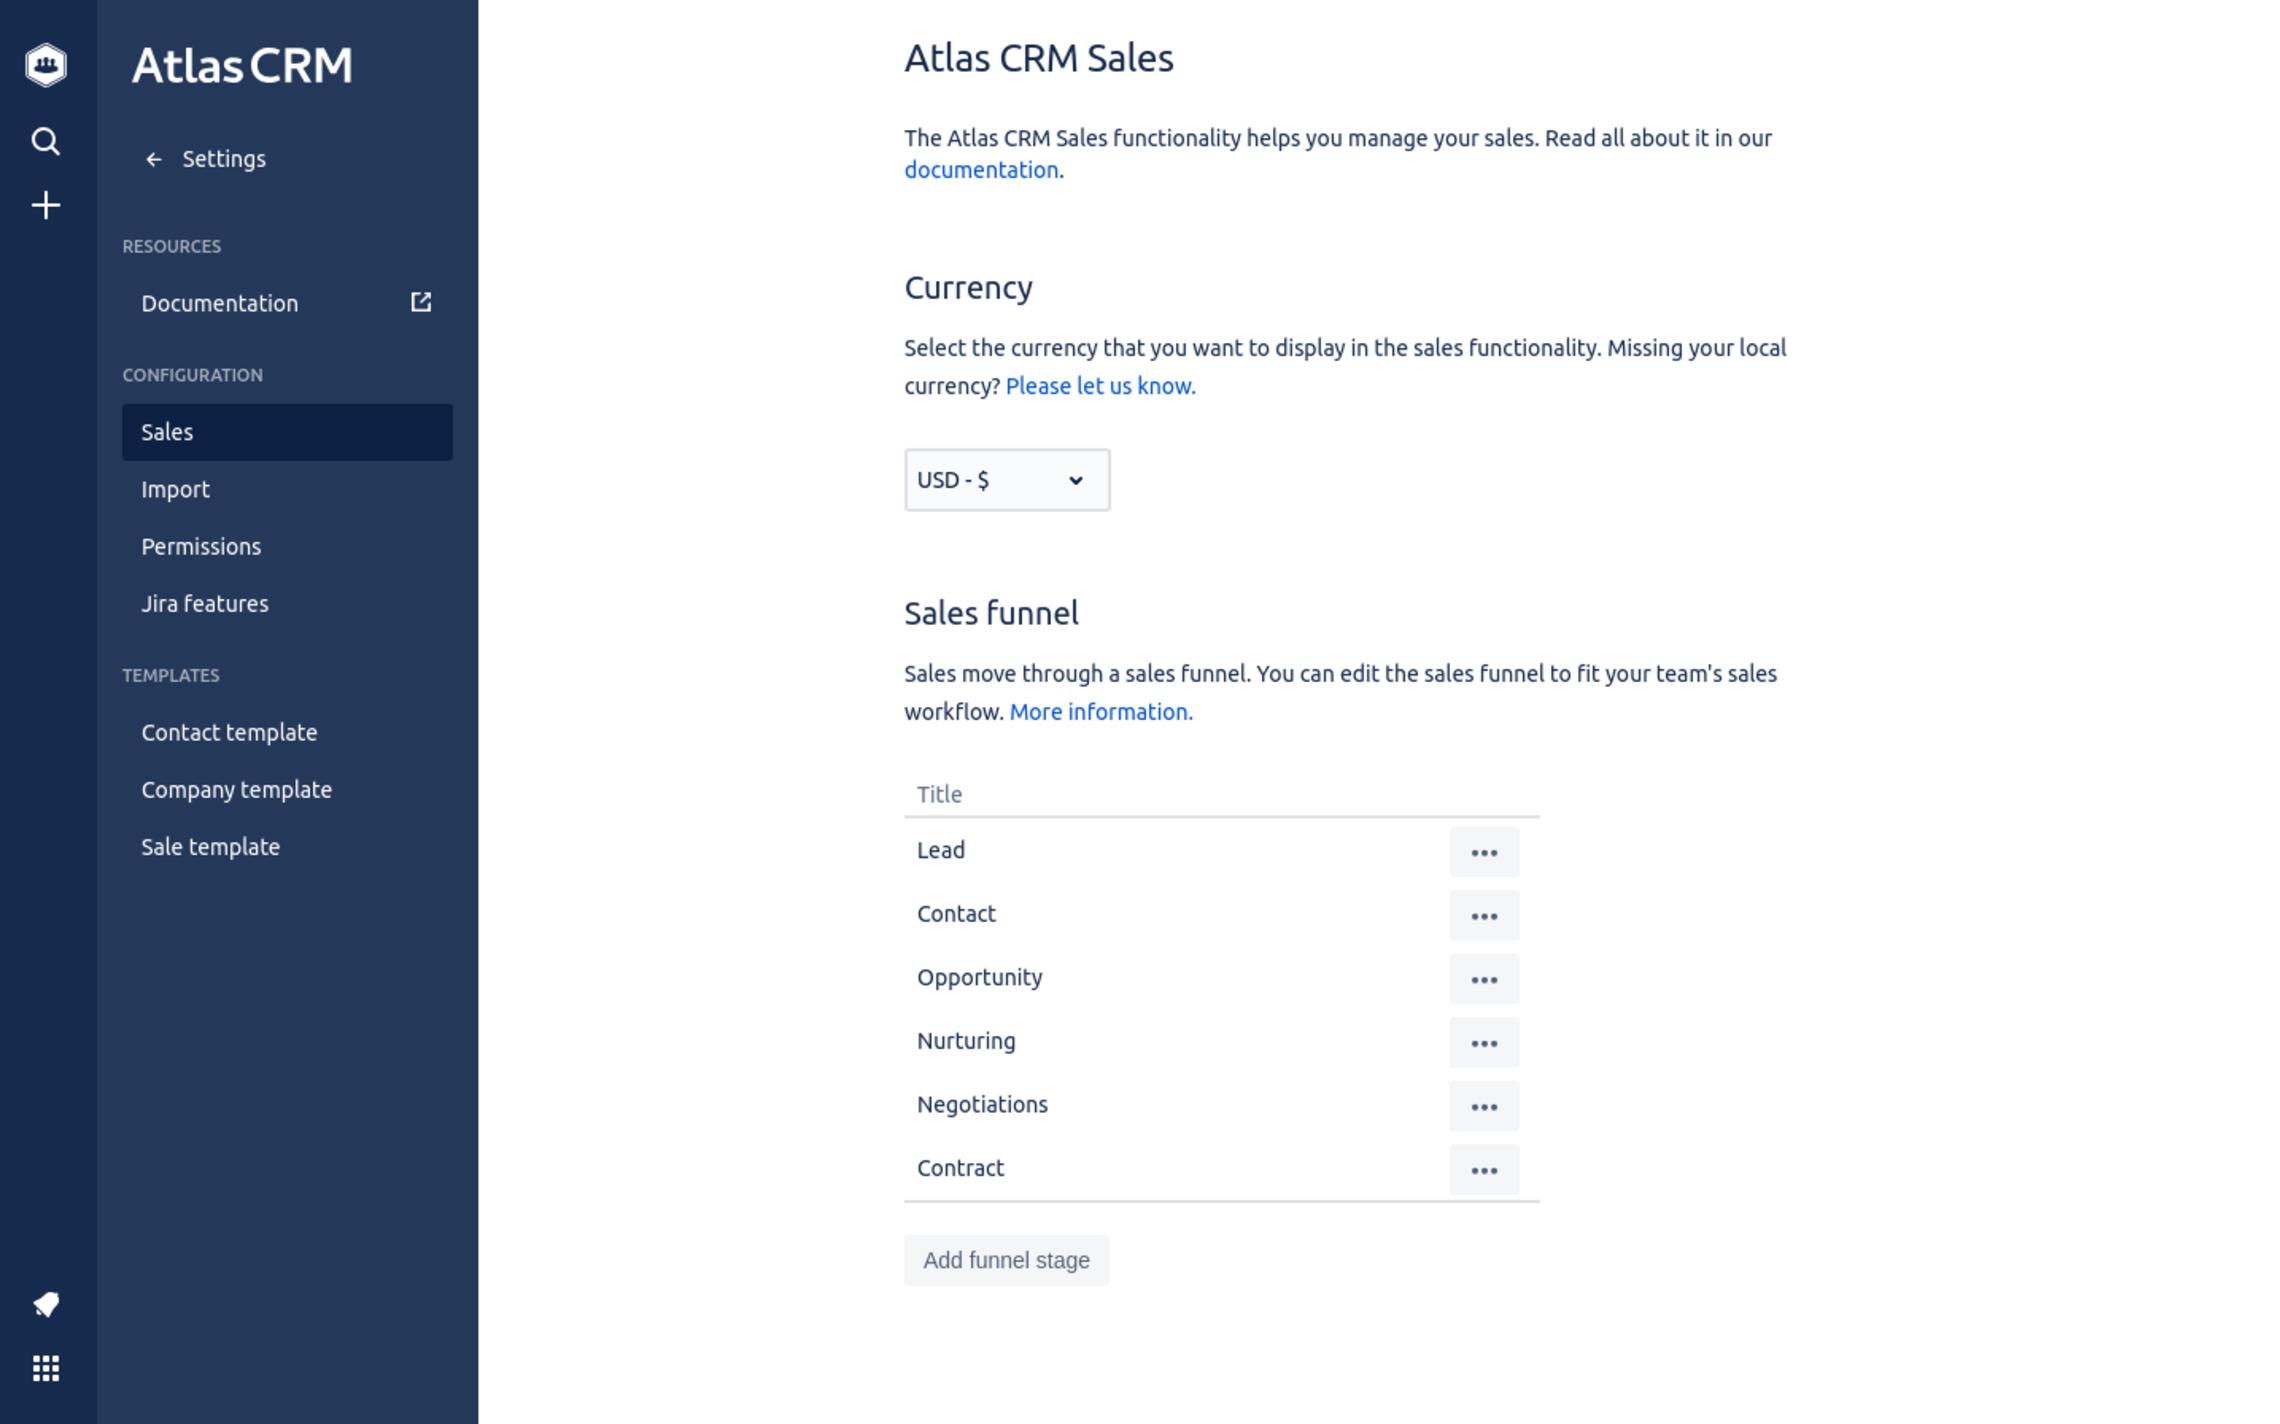 Configure the sales funnel in Atlas CRM